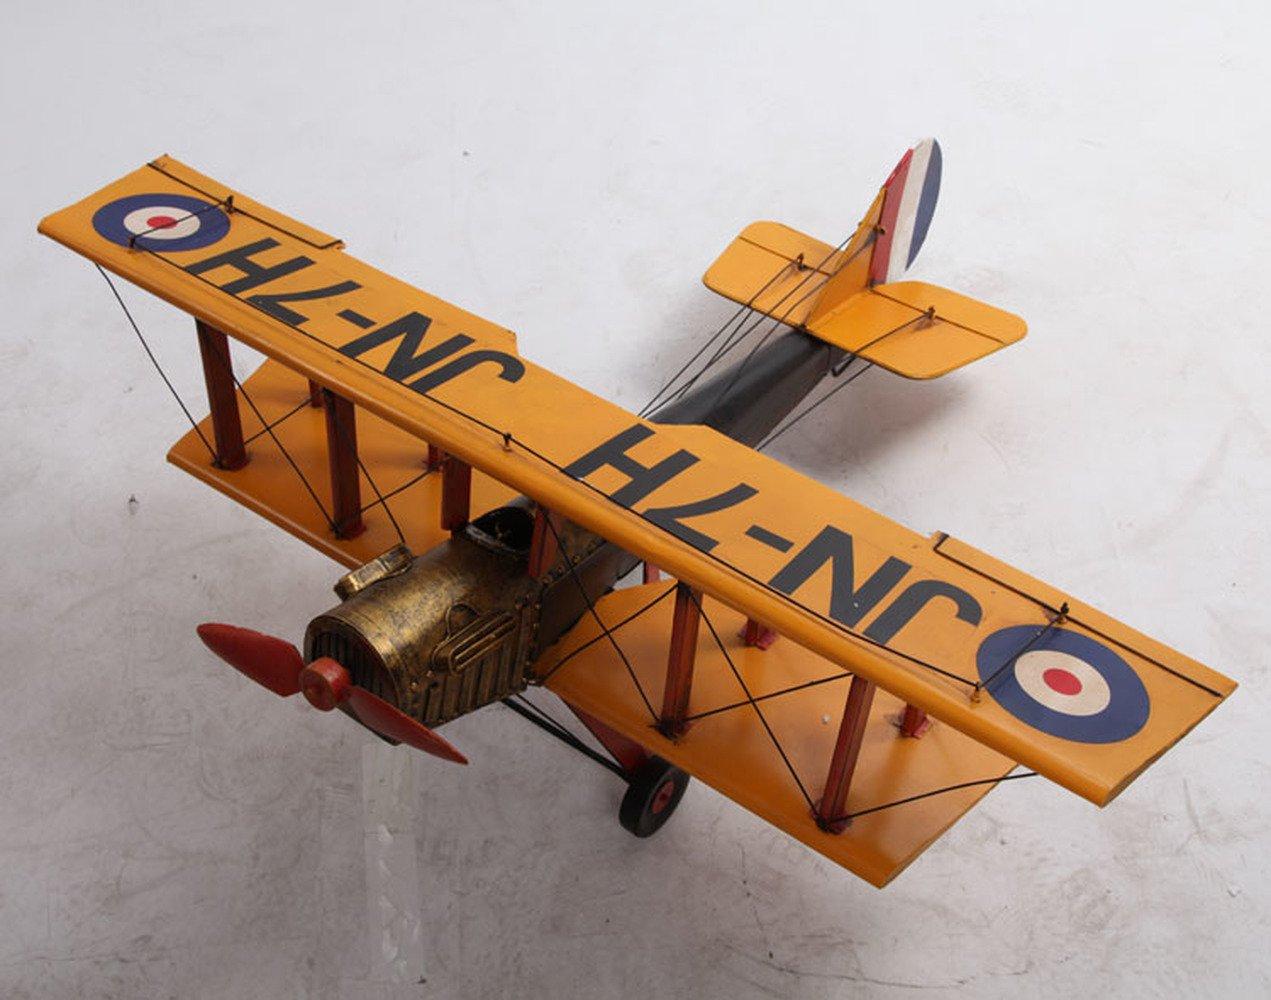 BWLZSP A PCS Retro aircraft model Iron ornaments Handmade crafts Antique fighters Window decorations AP5241555